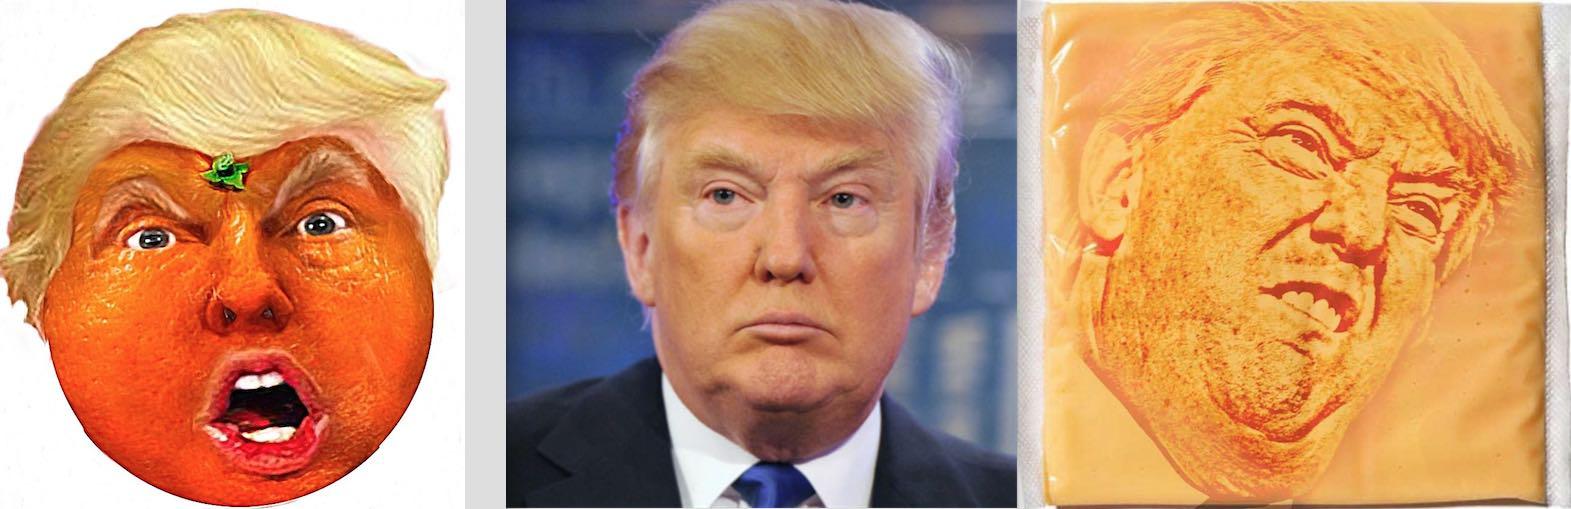 Donald Trump color complexion orange